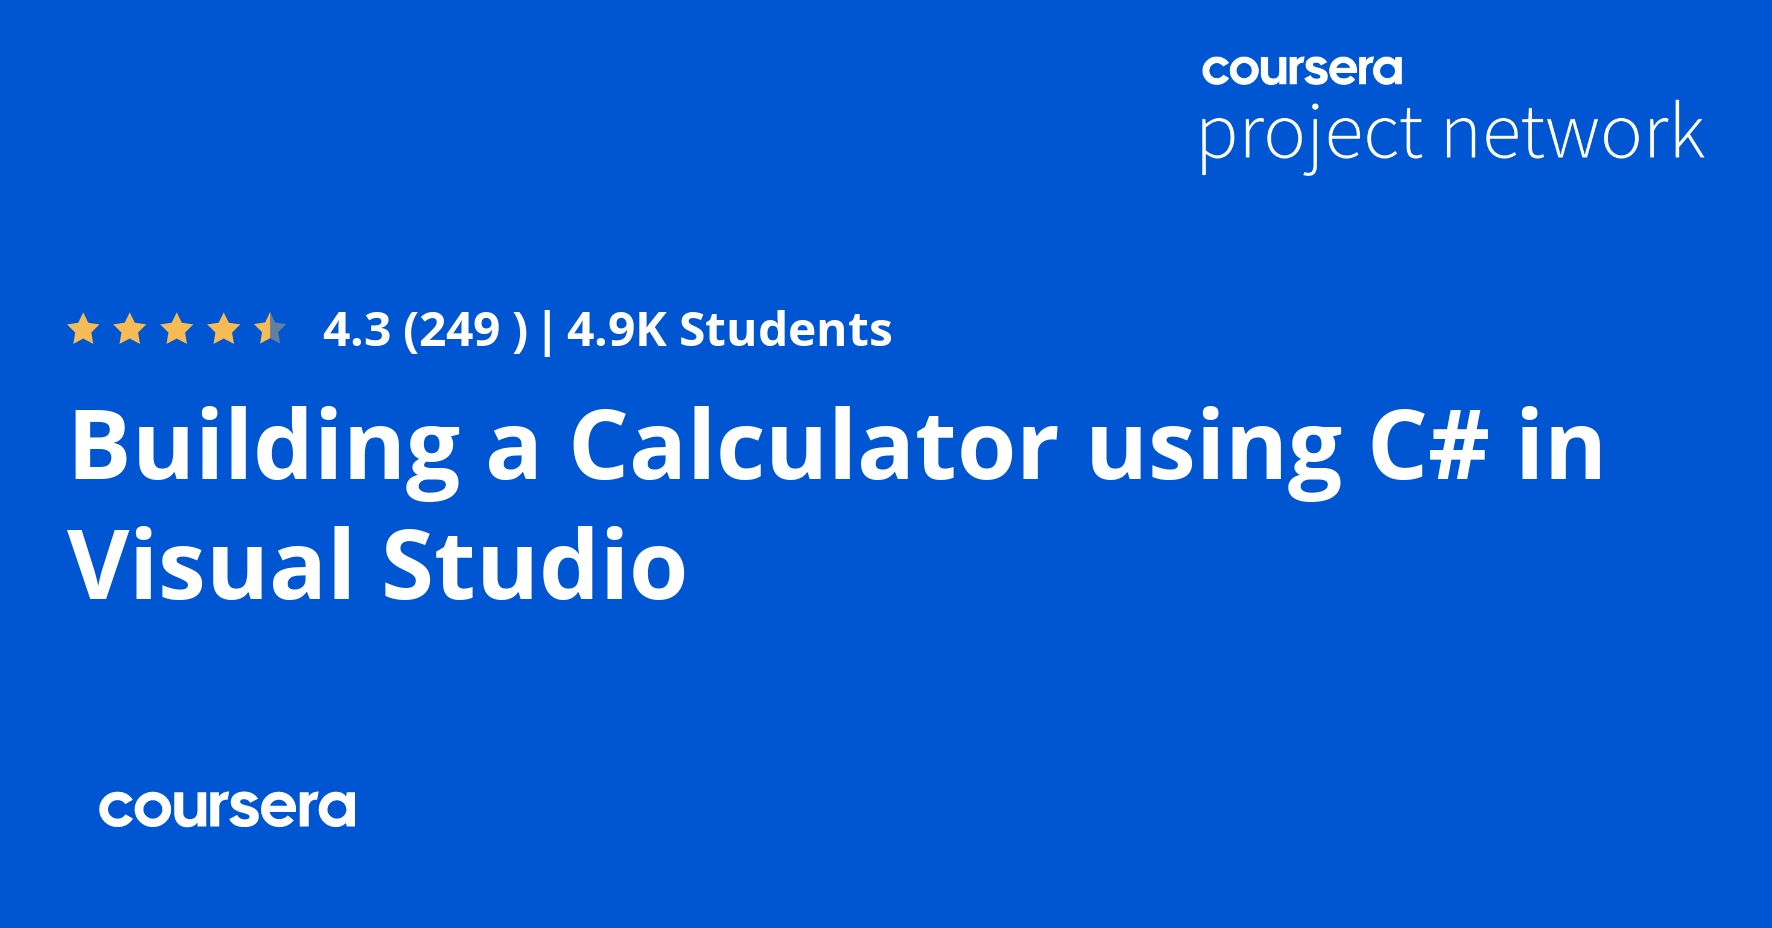 Building a Calculator using C# in Visual Studio